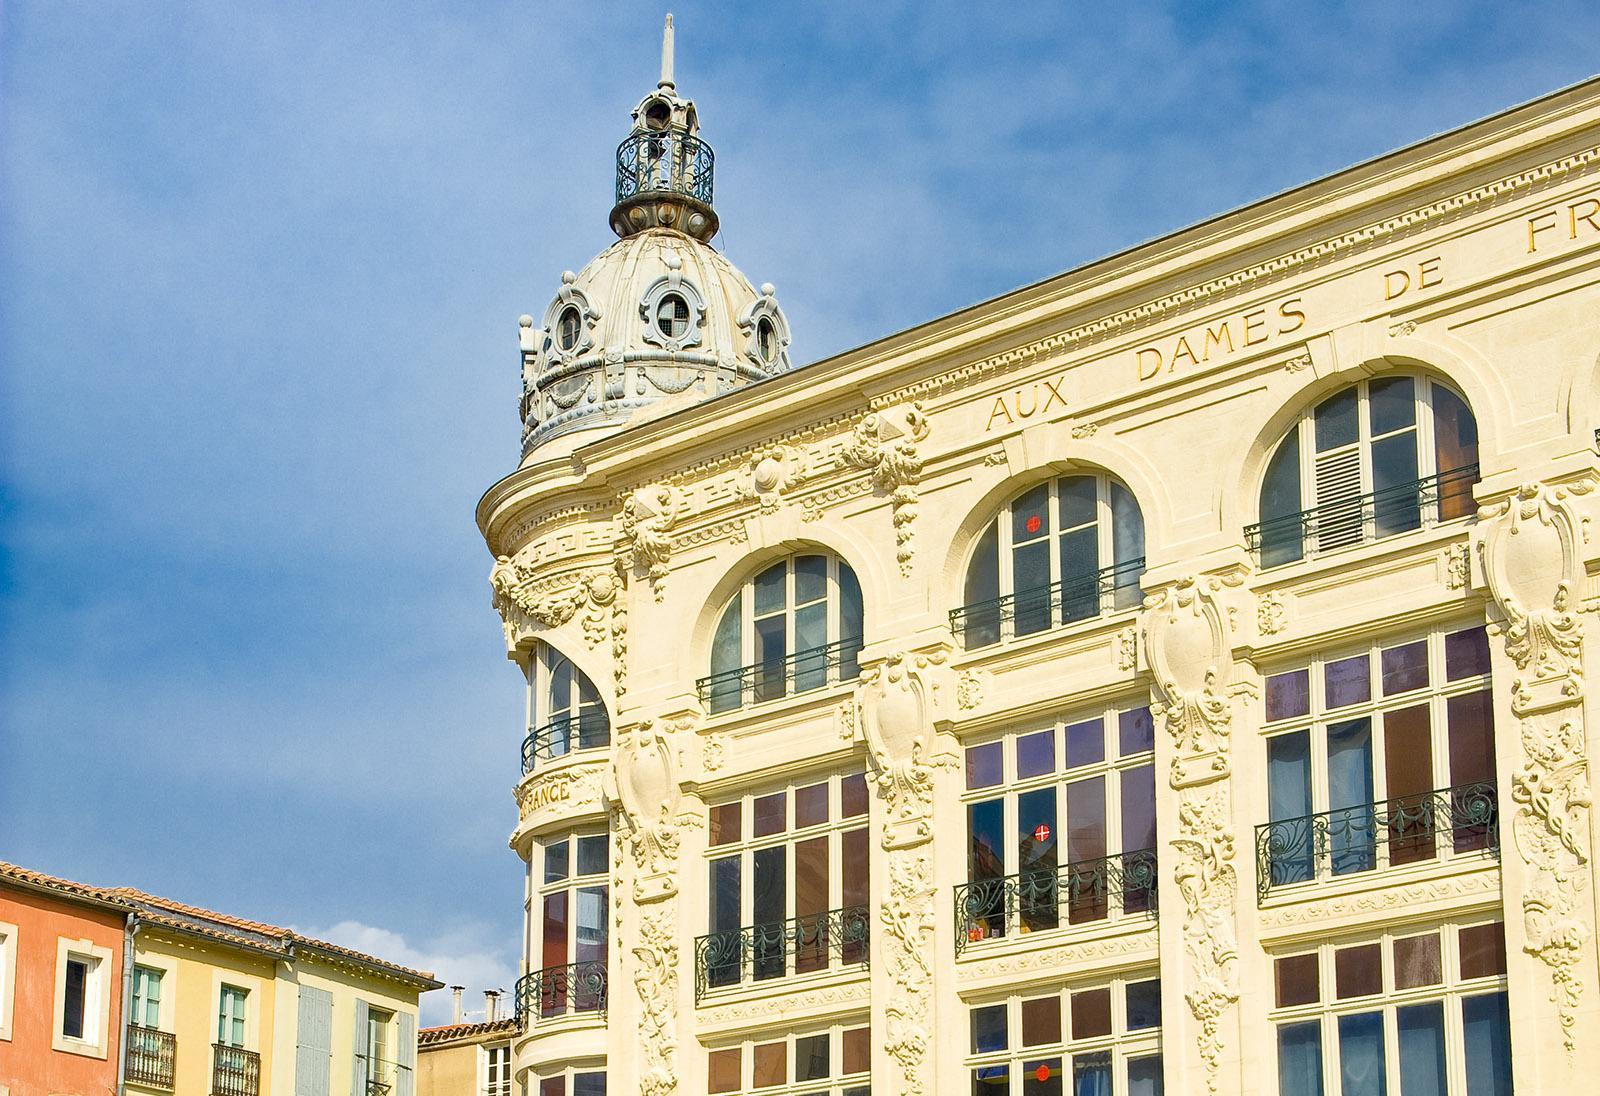 Narbonne: Nobel, diese Kaufhausfassade gegenüber der Kathedrale! Foto: Hilke Maunder